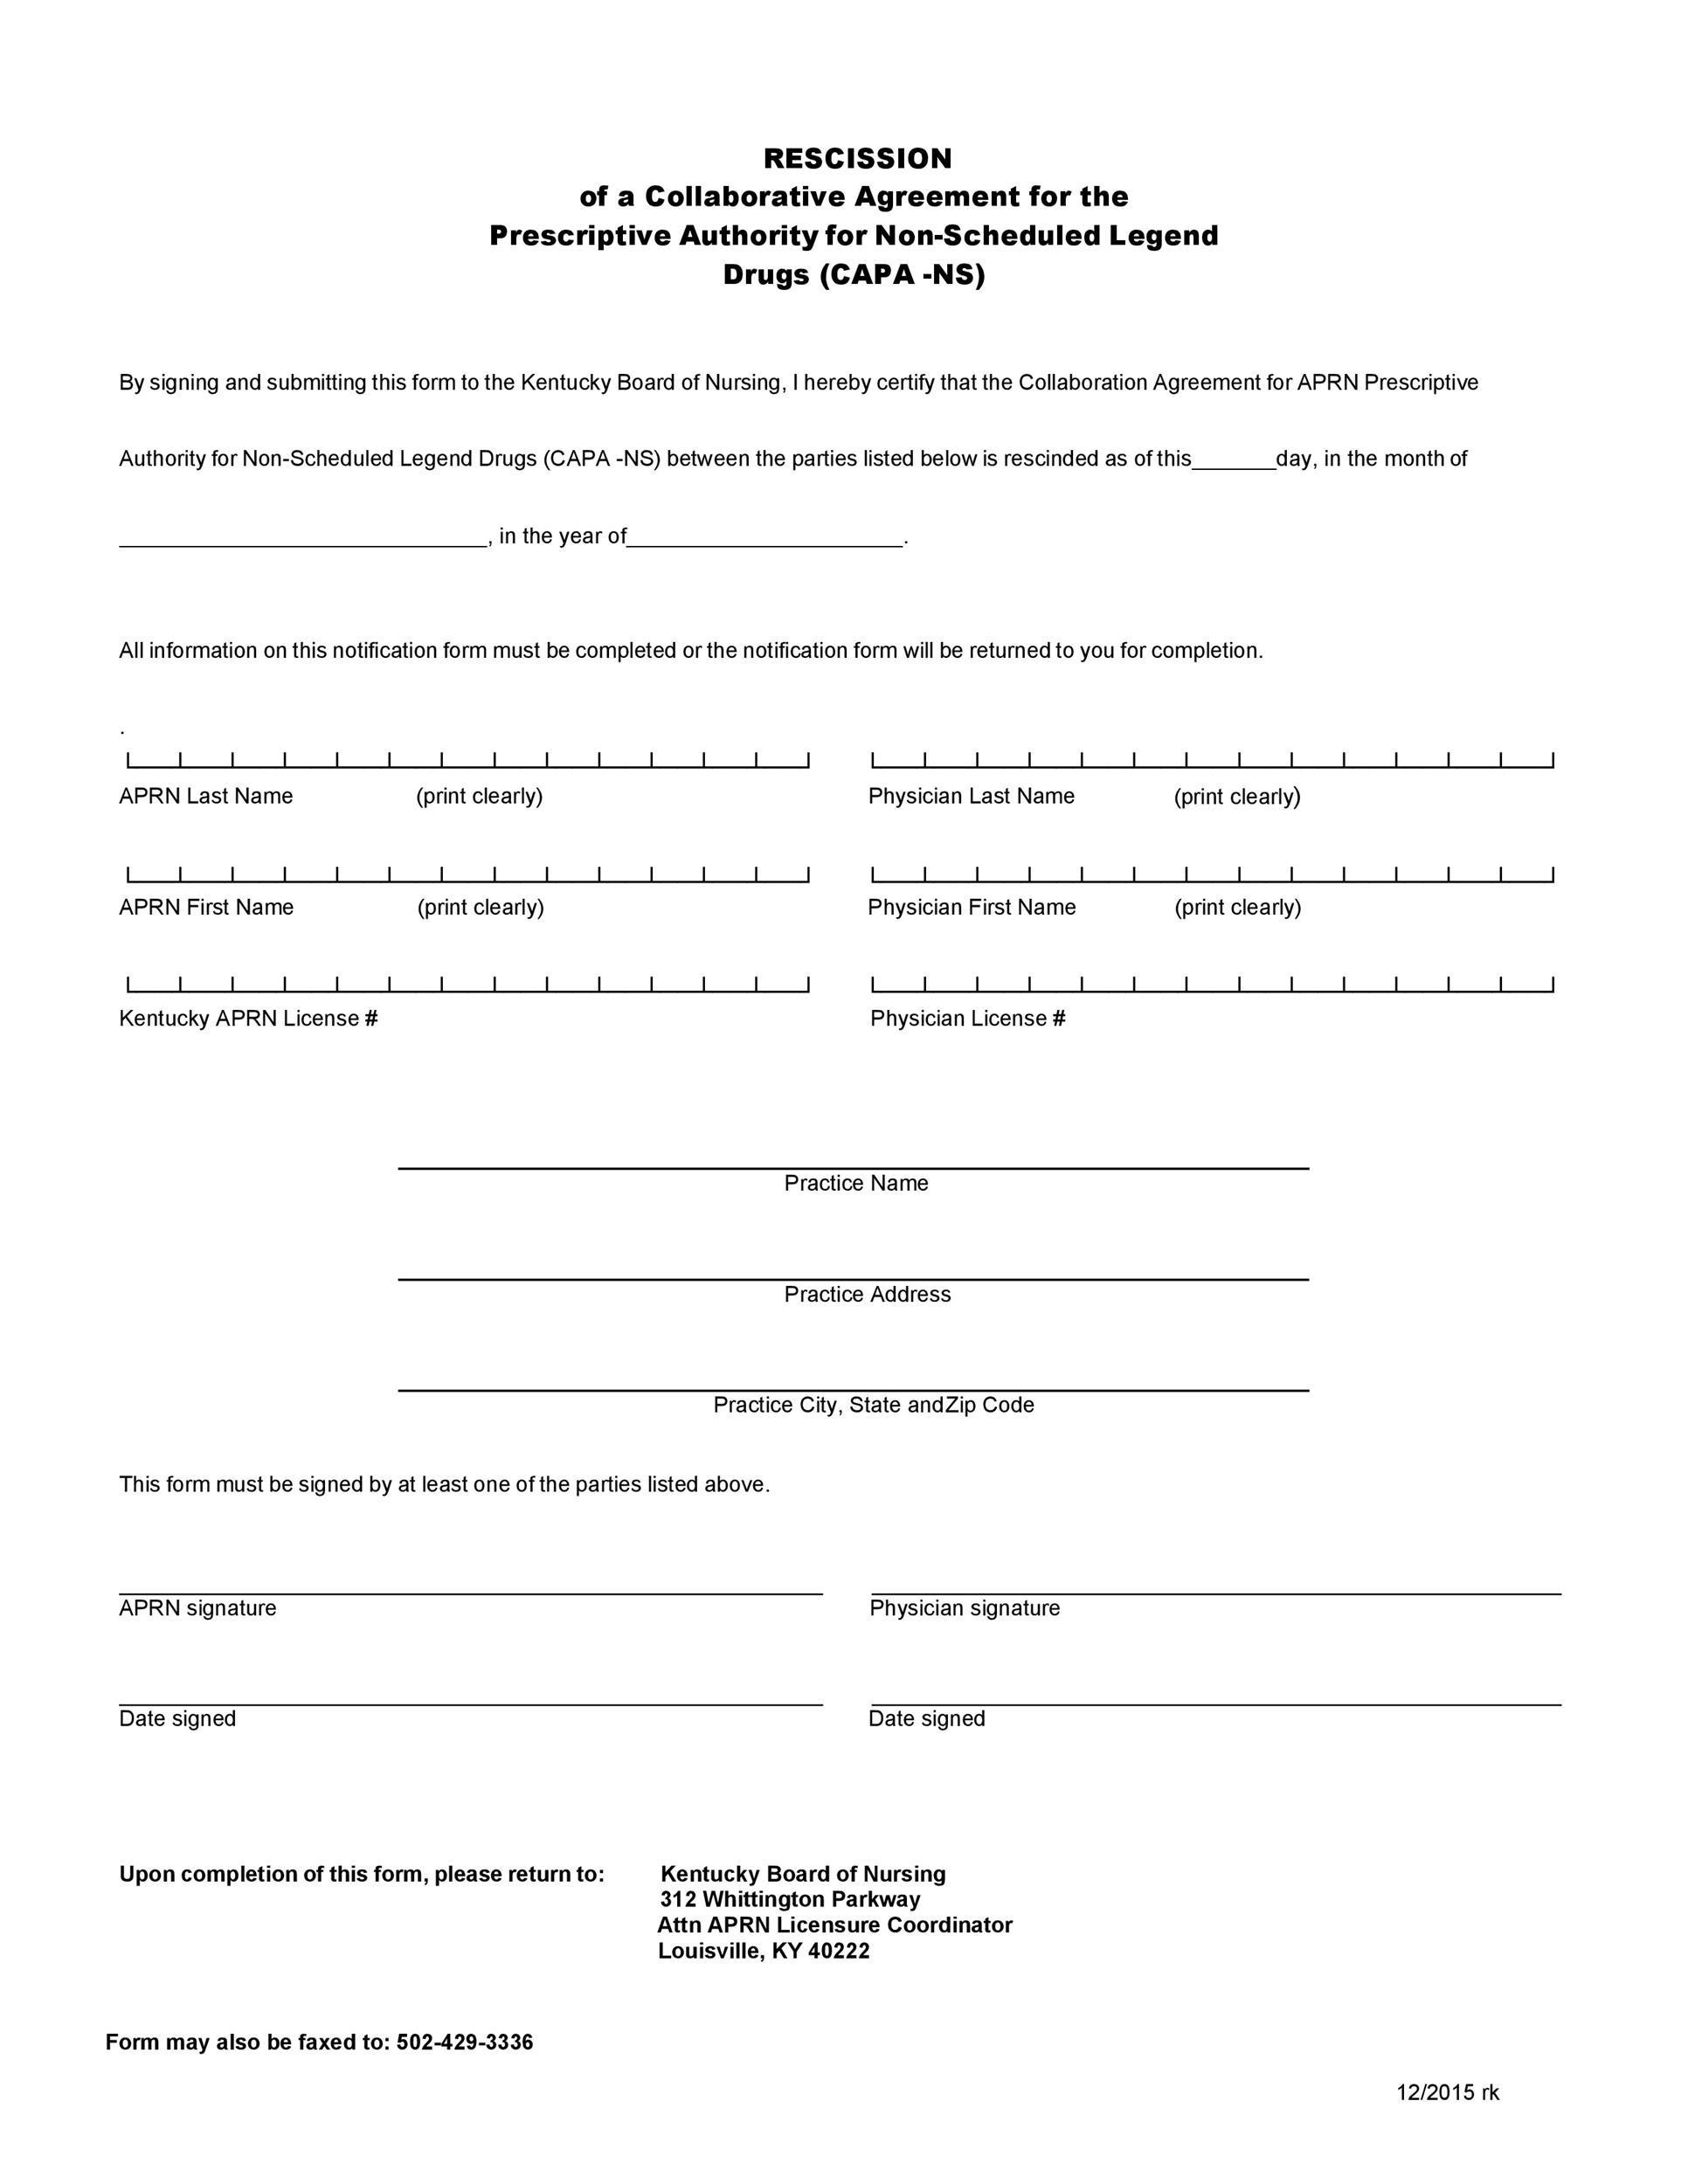 Free rescission agreement 12